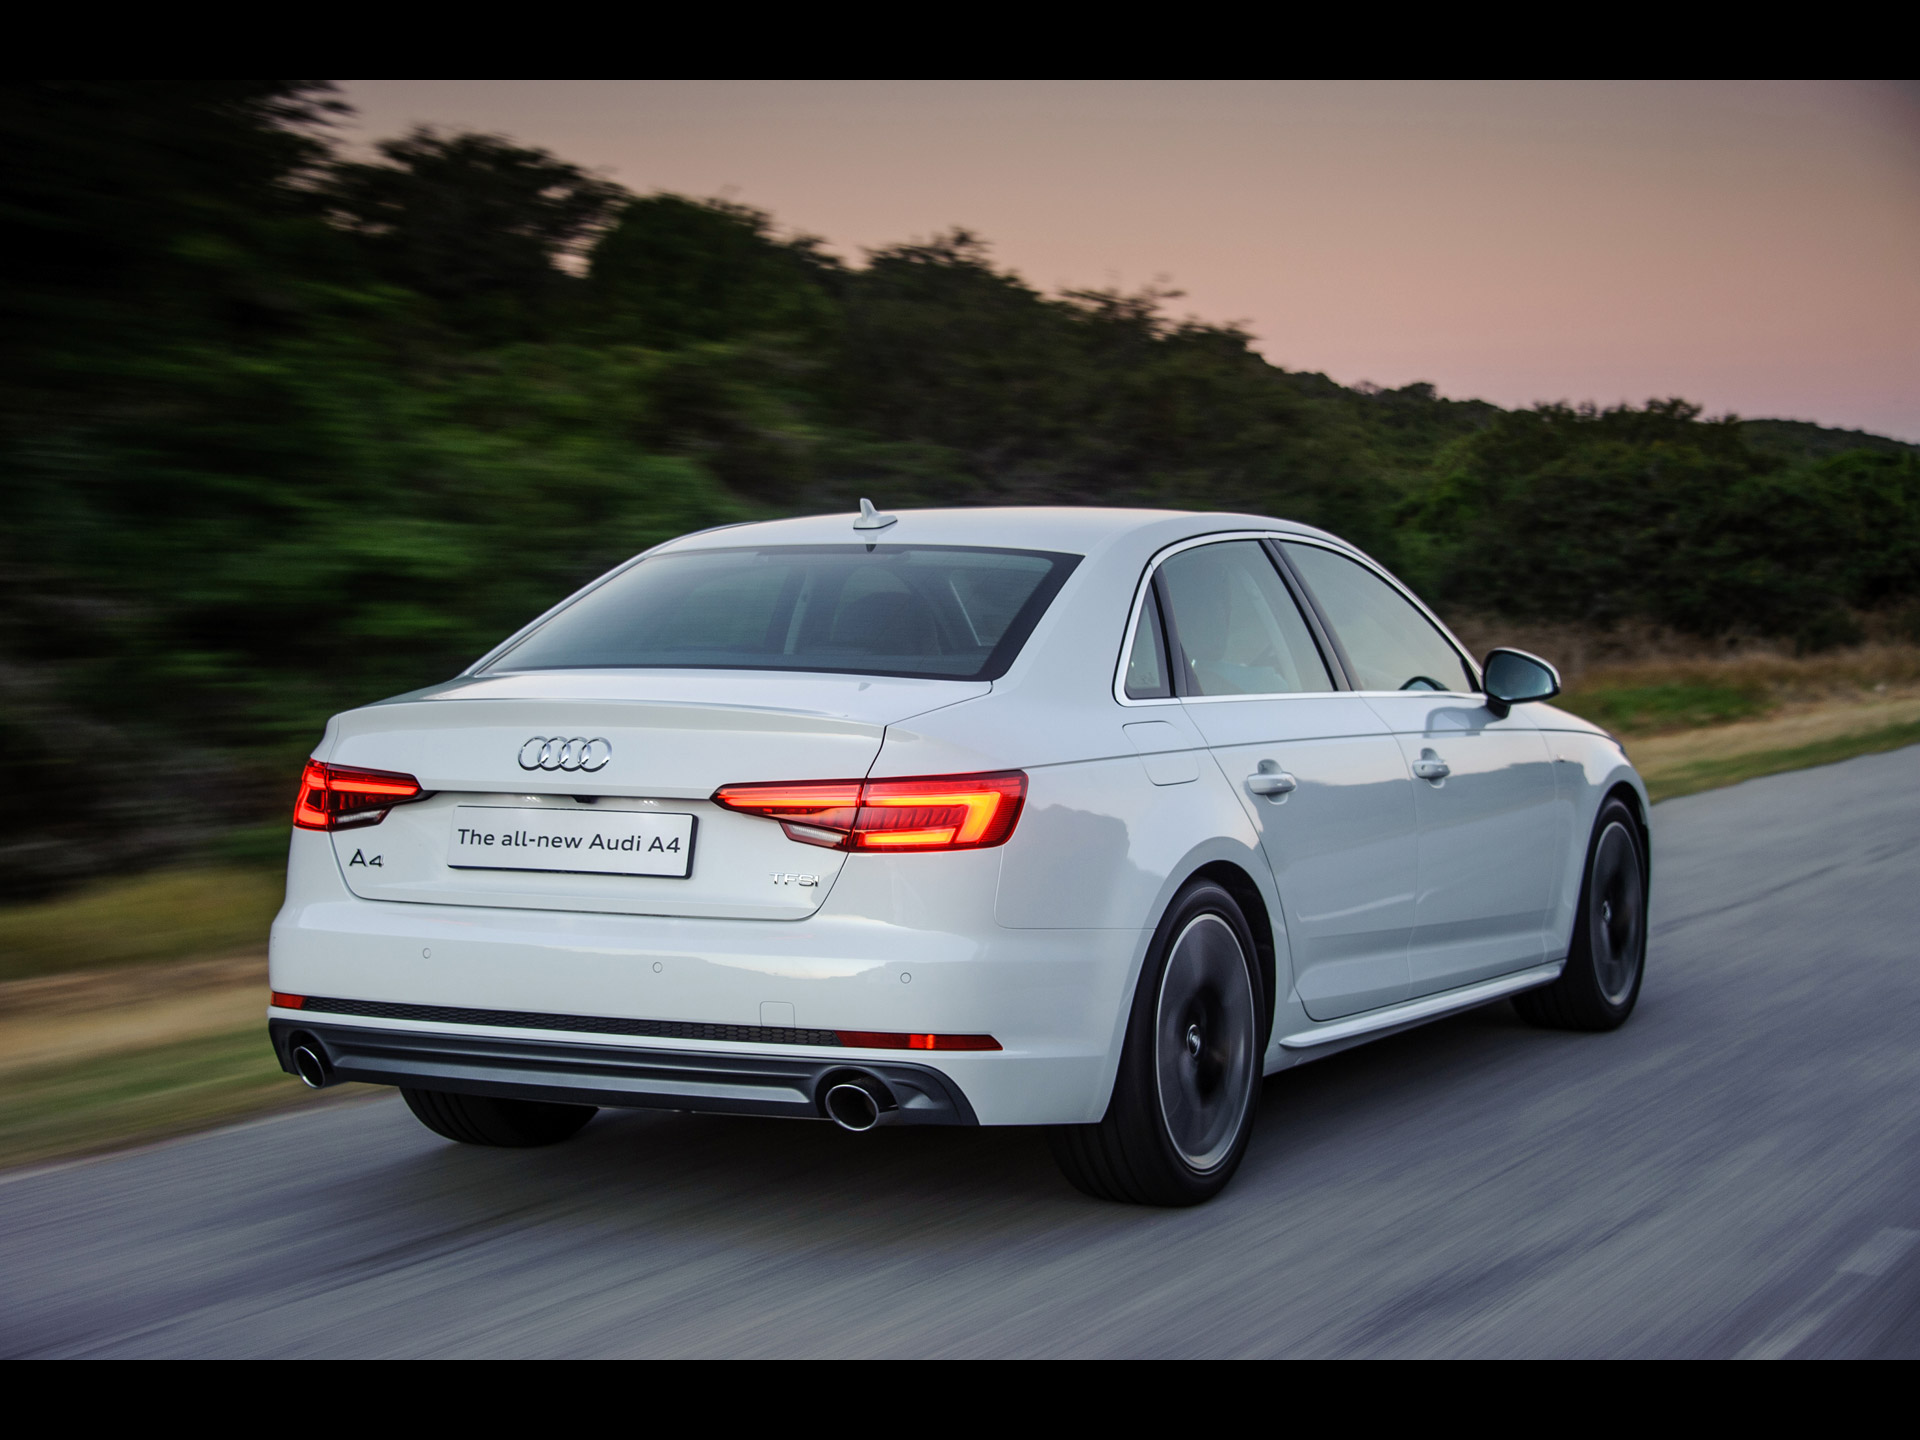 Audi A4 B9 Discussion Thread  Audi  Automotive